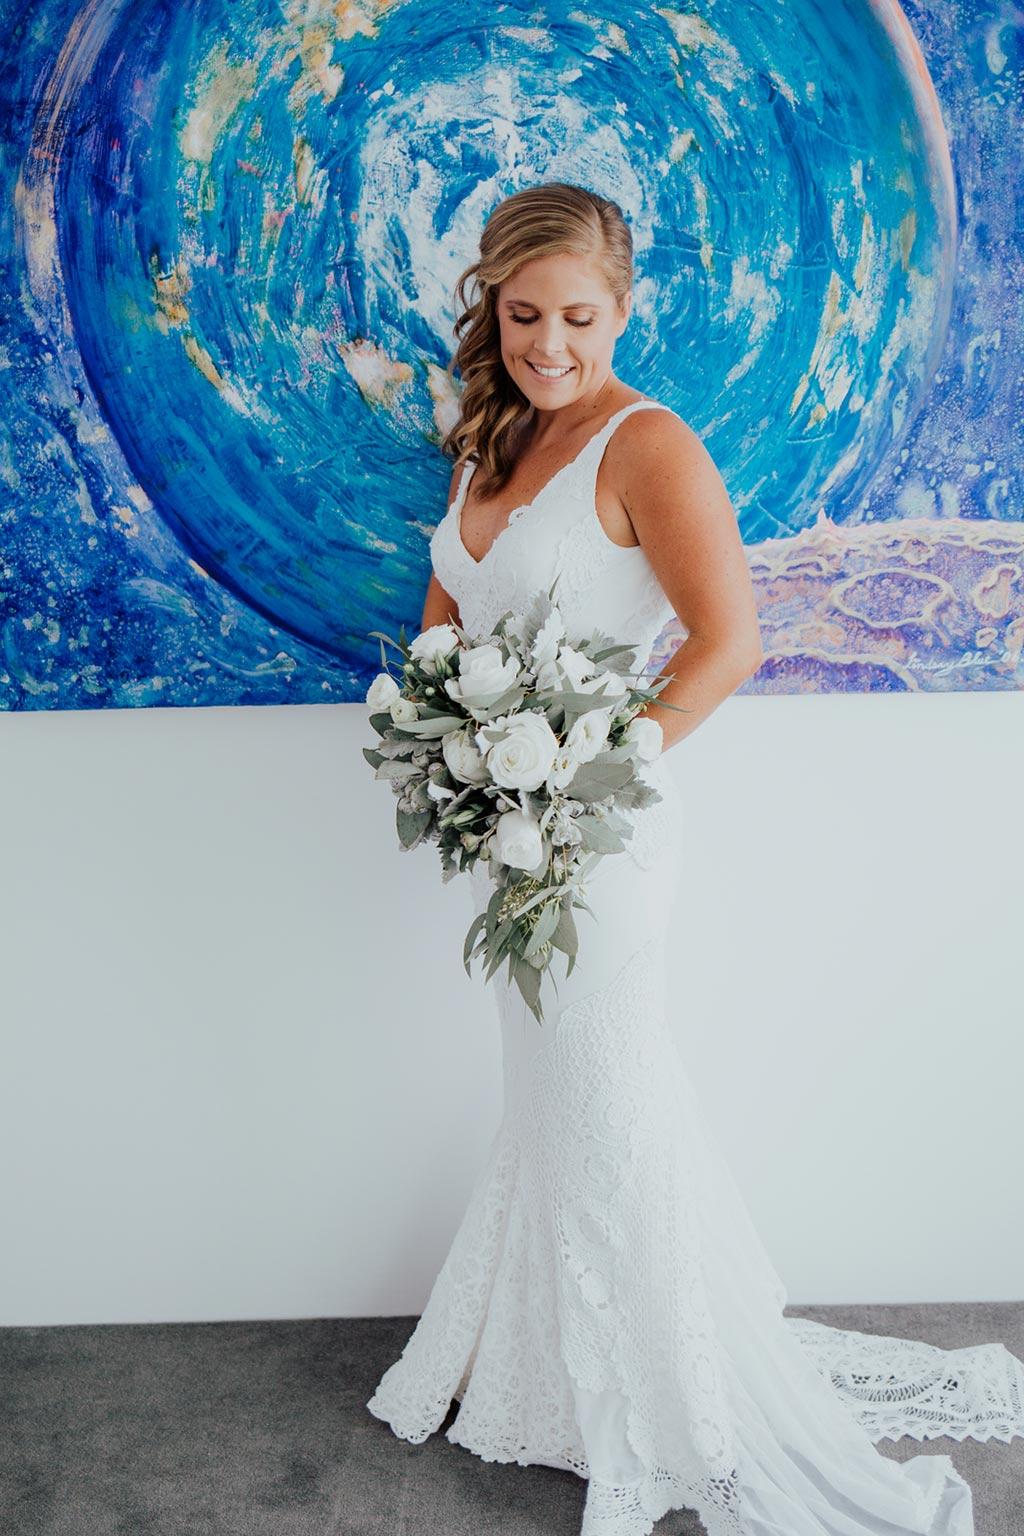 Carl & Kandice - Gold Coast elopement - Kirk Willcox Photography